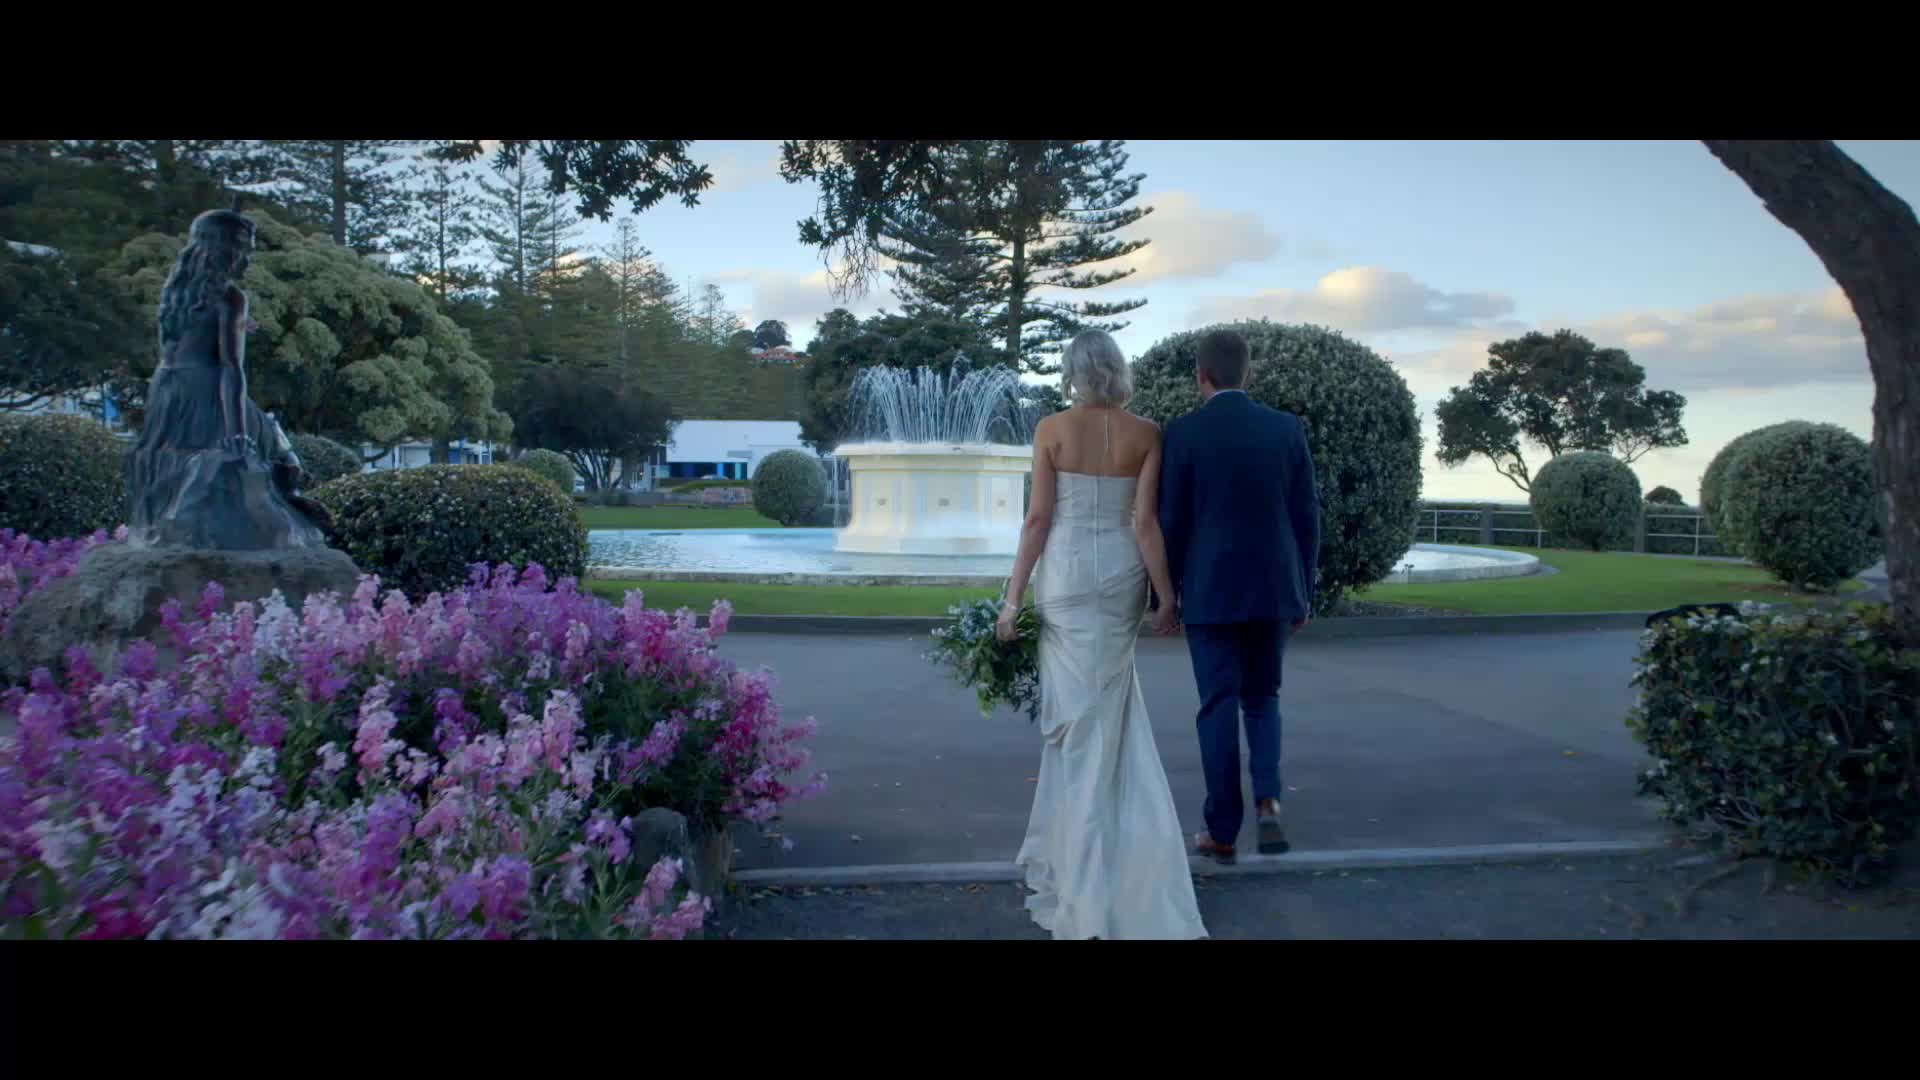 Napier Conference Centre - Wedding 1 GIFs